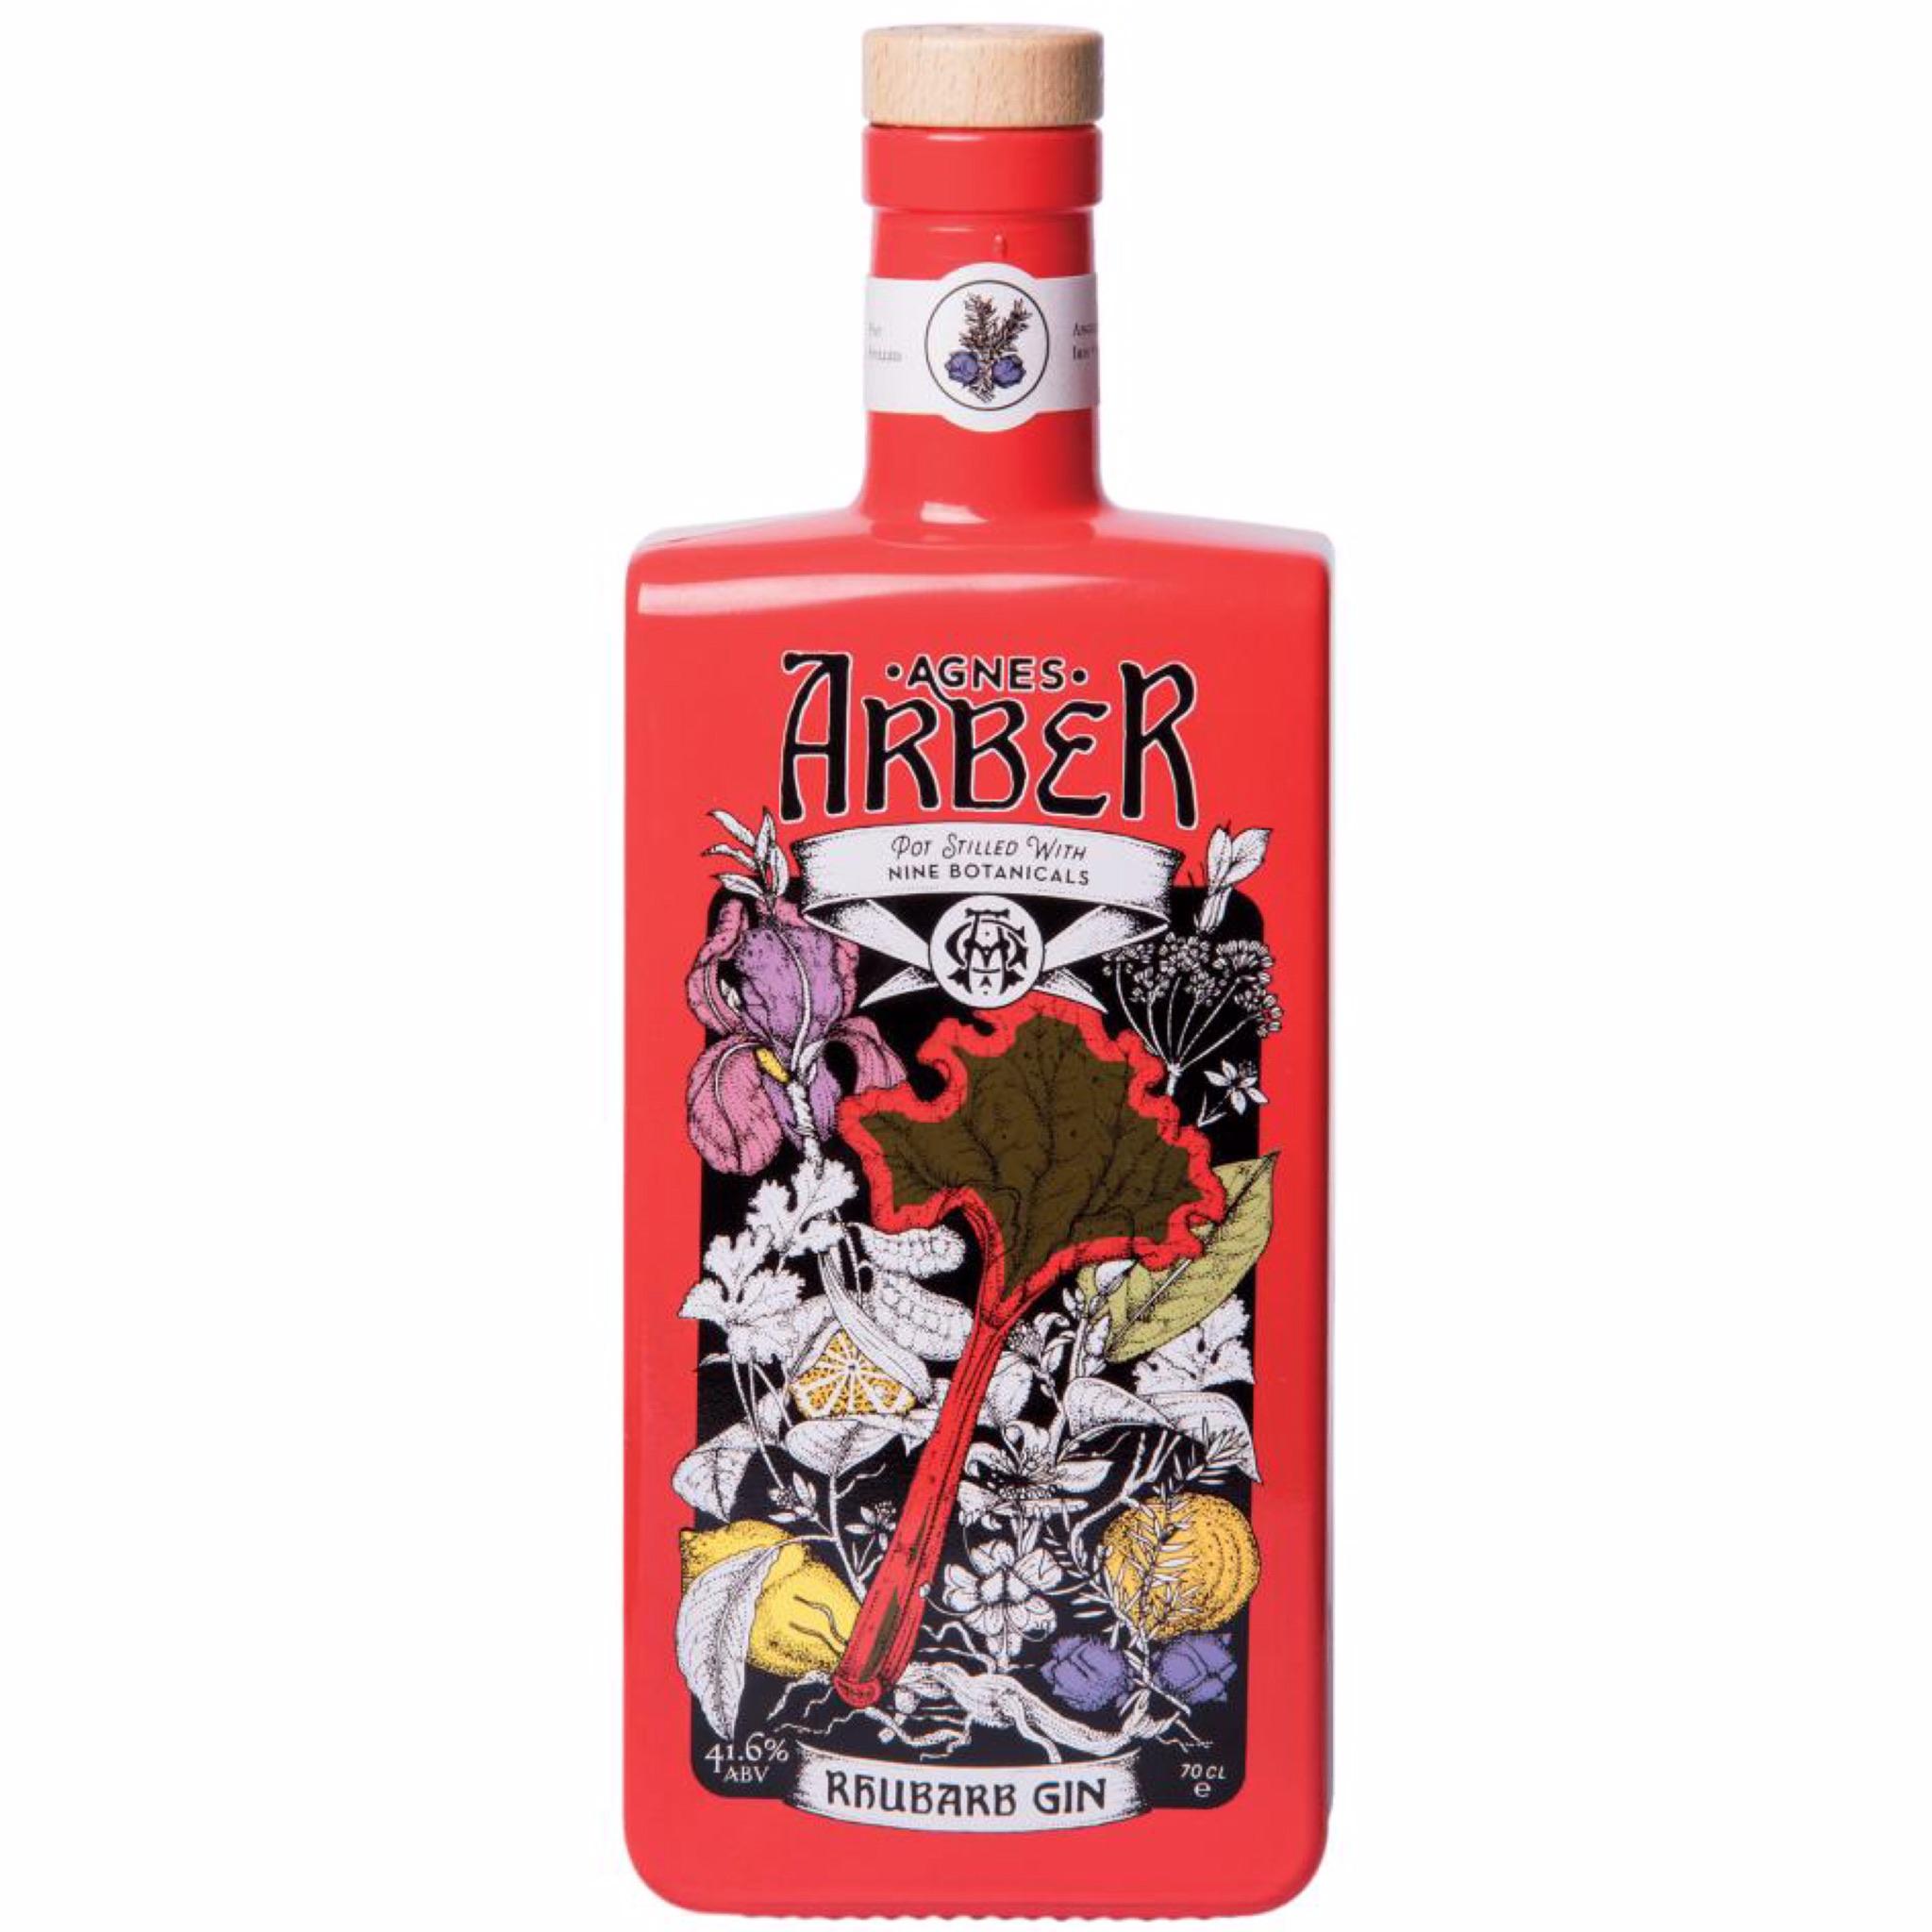 Agnes Arber Rhubarb Gin 41.6% 700ml